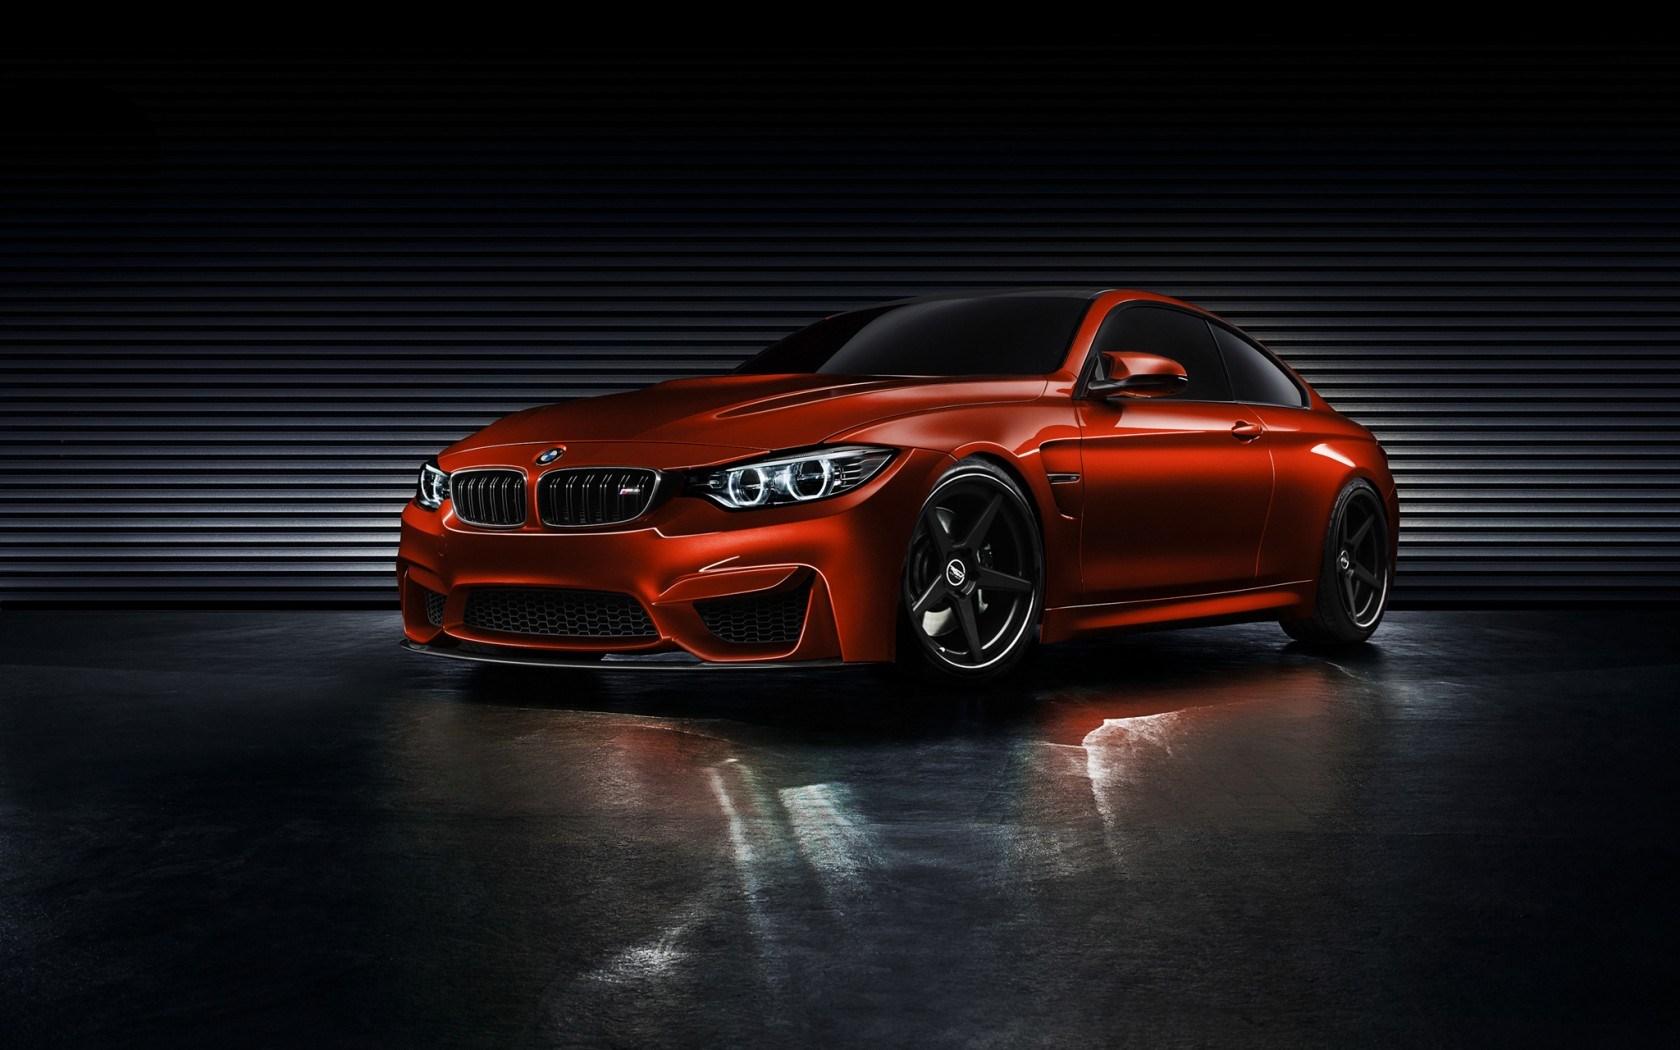 F32 BMW M4 Concept